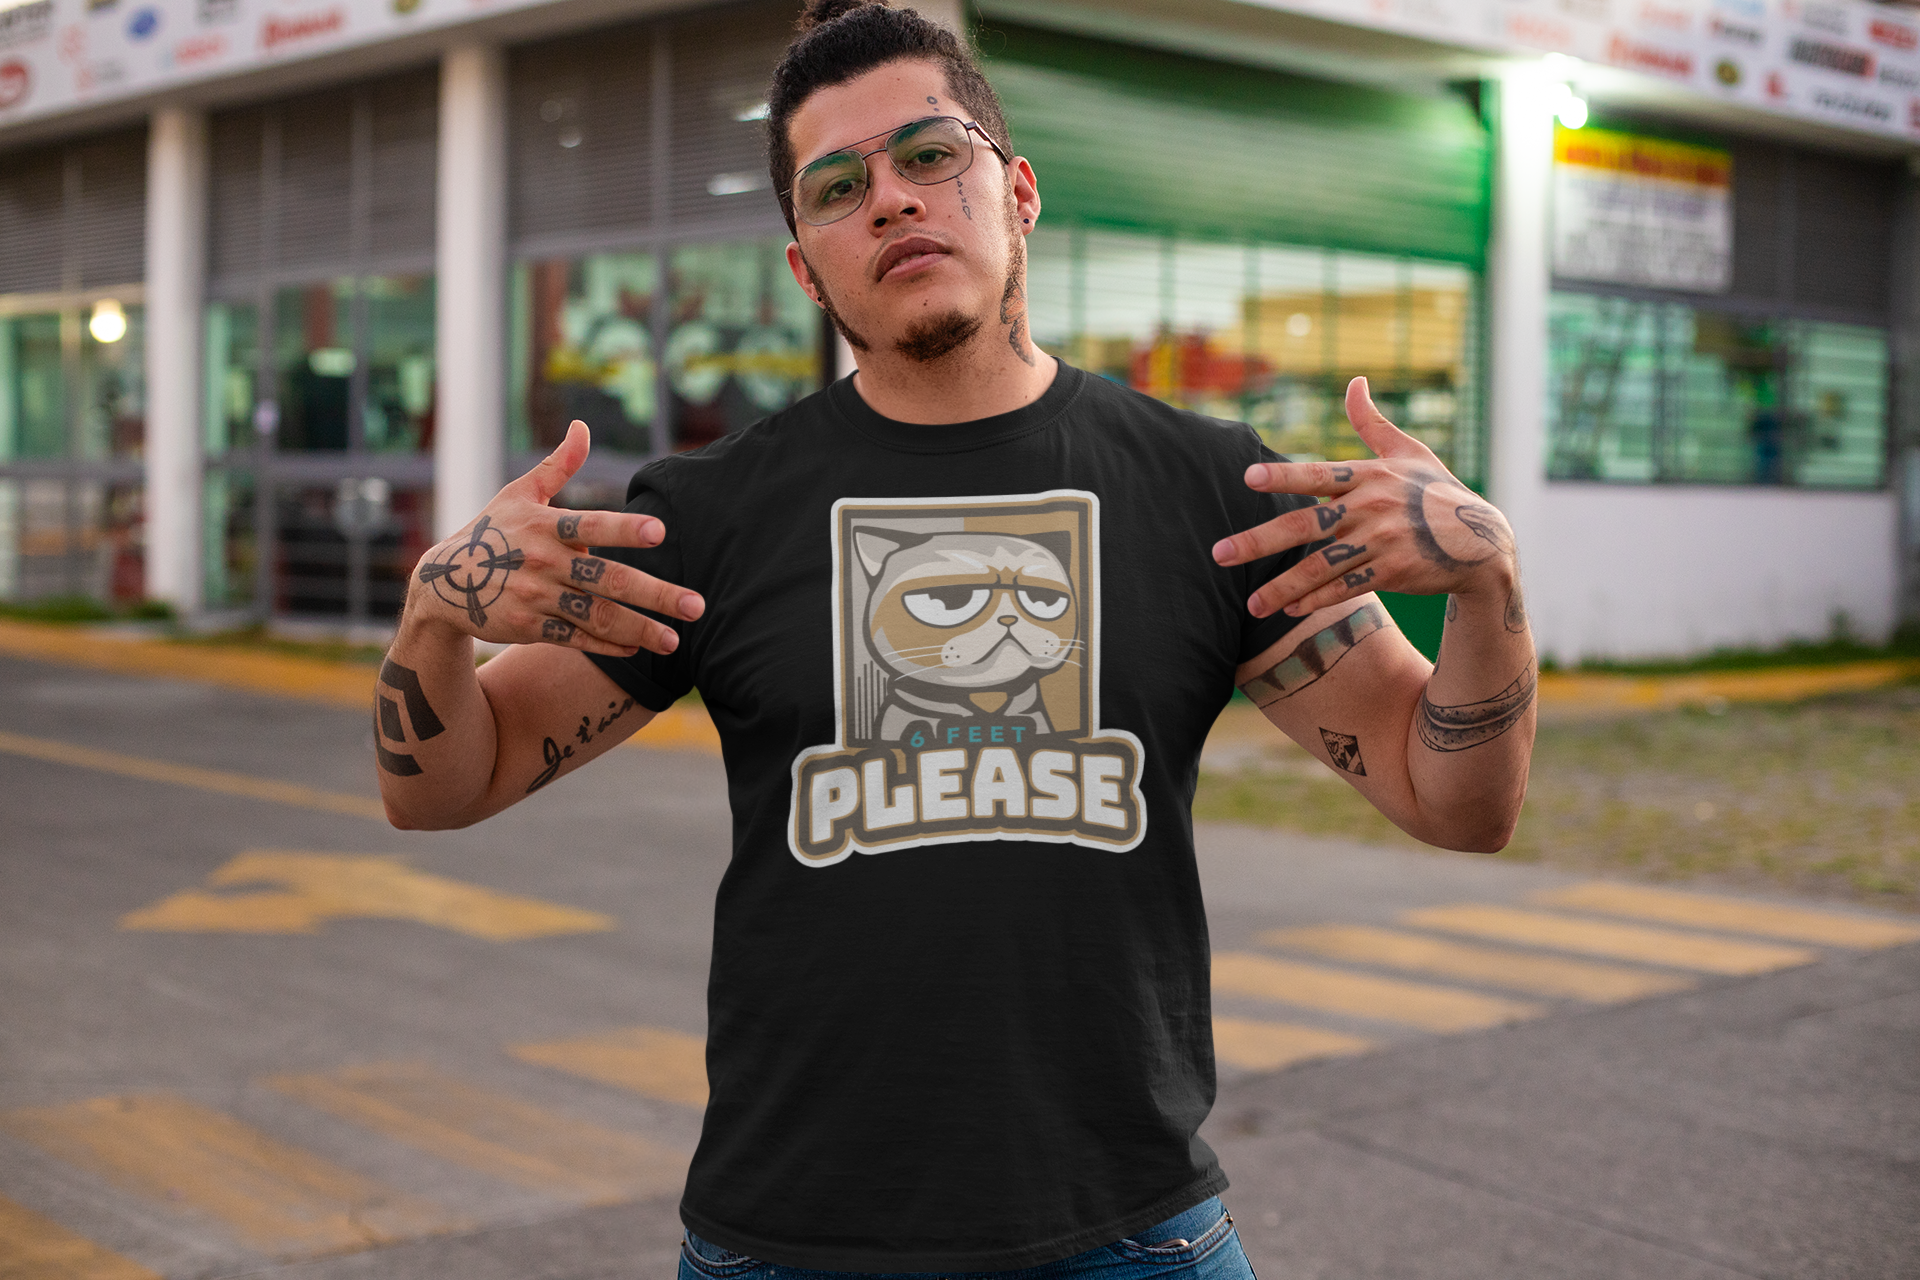 t-shirt-mockup-of-a-tattooed-man-showing